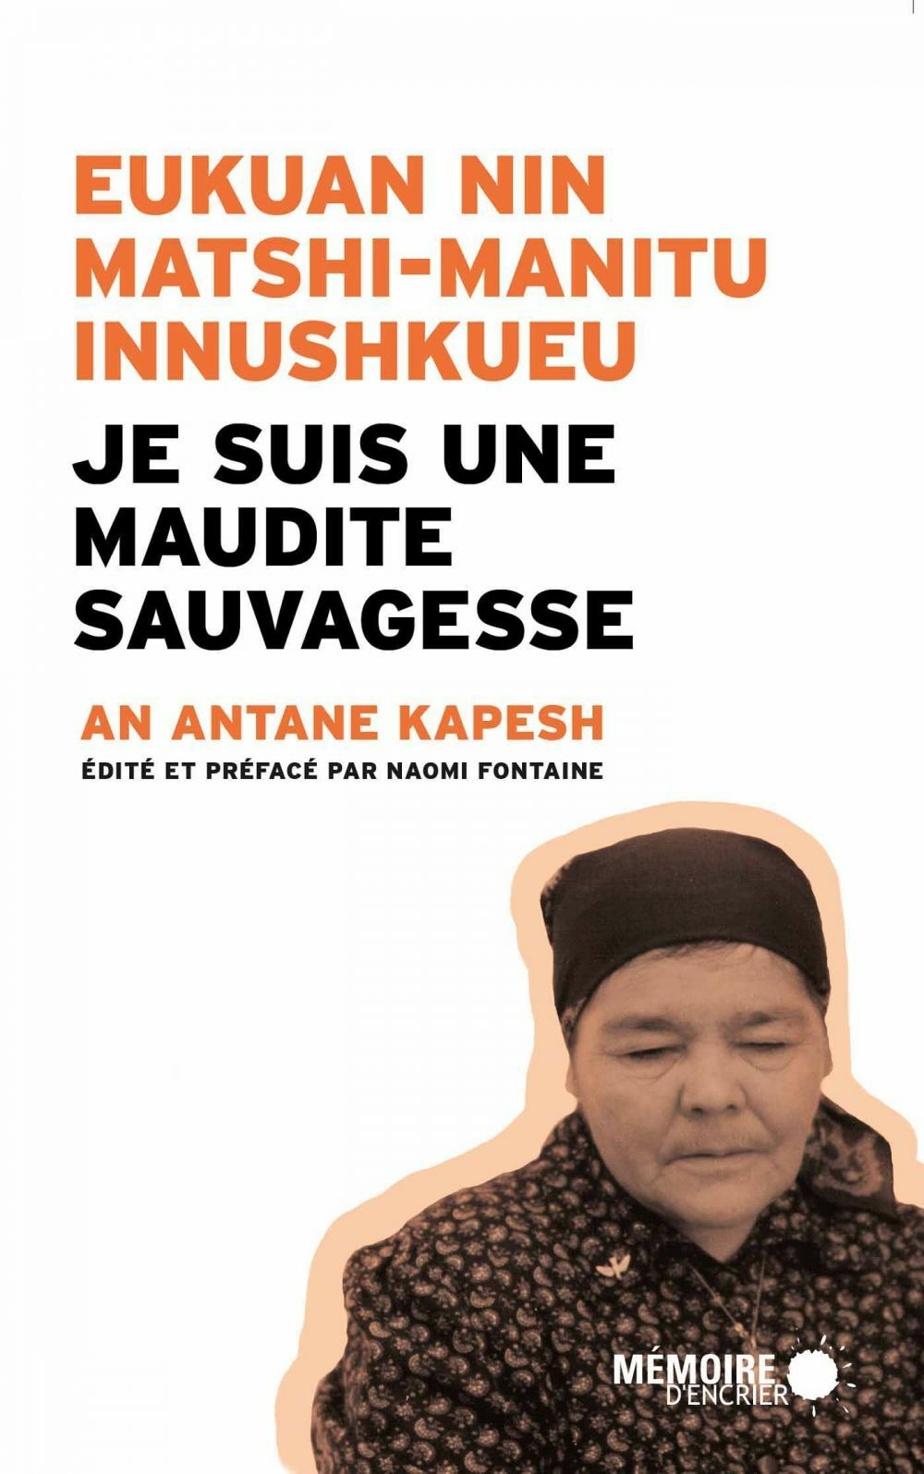 Eukuan nin matshi-manitu innushkueu / Je suis une maudite sauvagesse, d'An Antane Kapesh (Mémoire d'encrier)